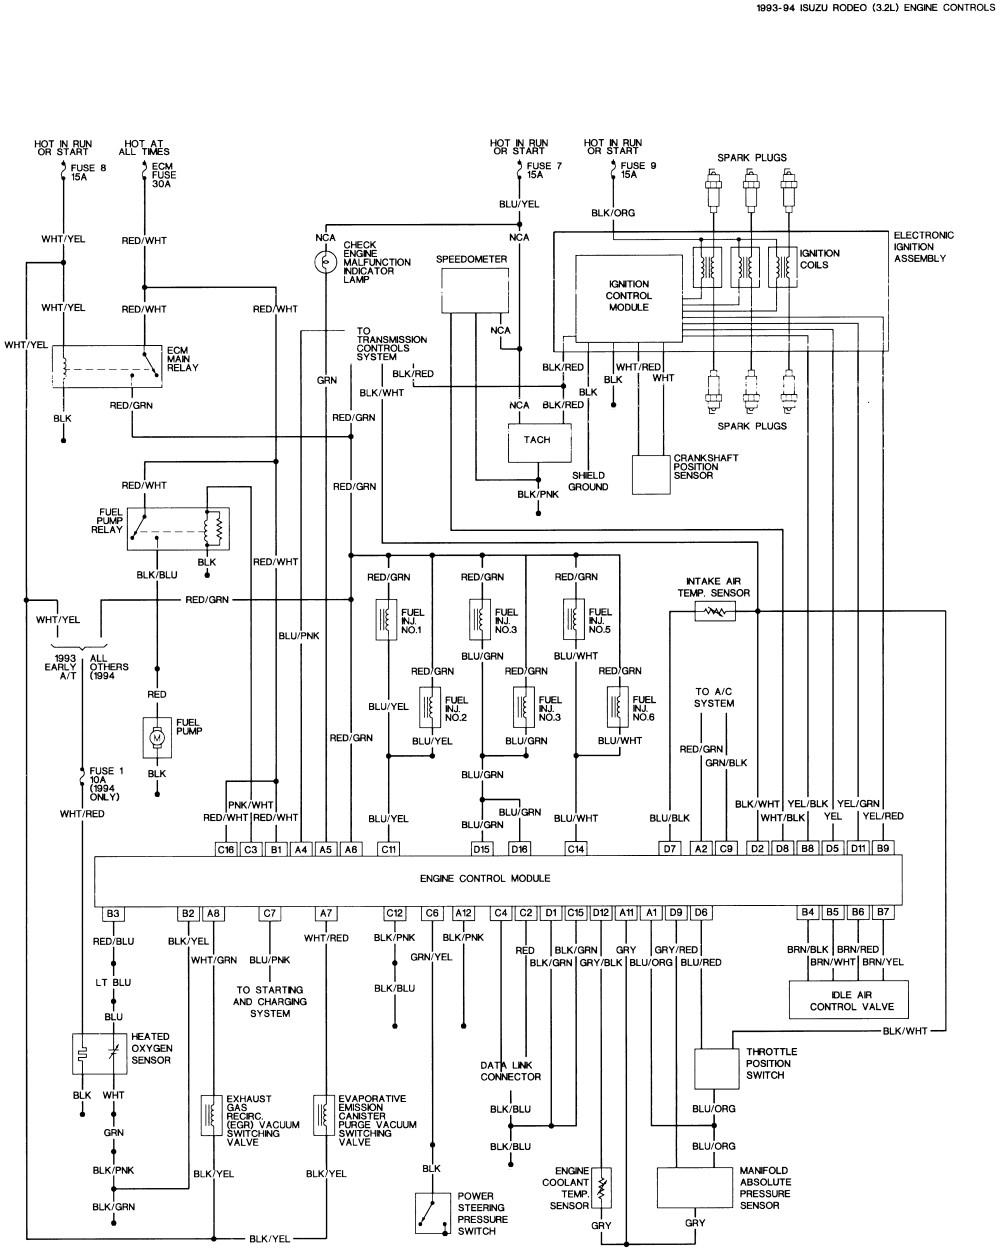 Isuzu Trooper Stereo Wiring Diagram Navigation On Like | Philteg.in - 2006 Isuzu Npr Wiring Diagram